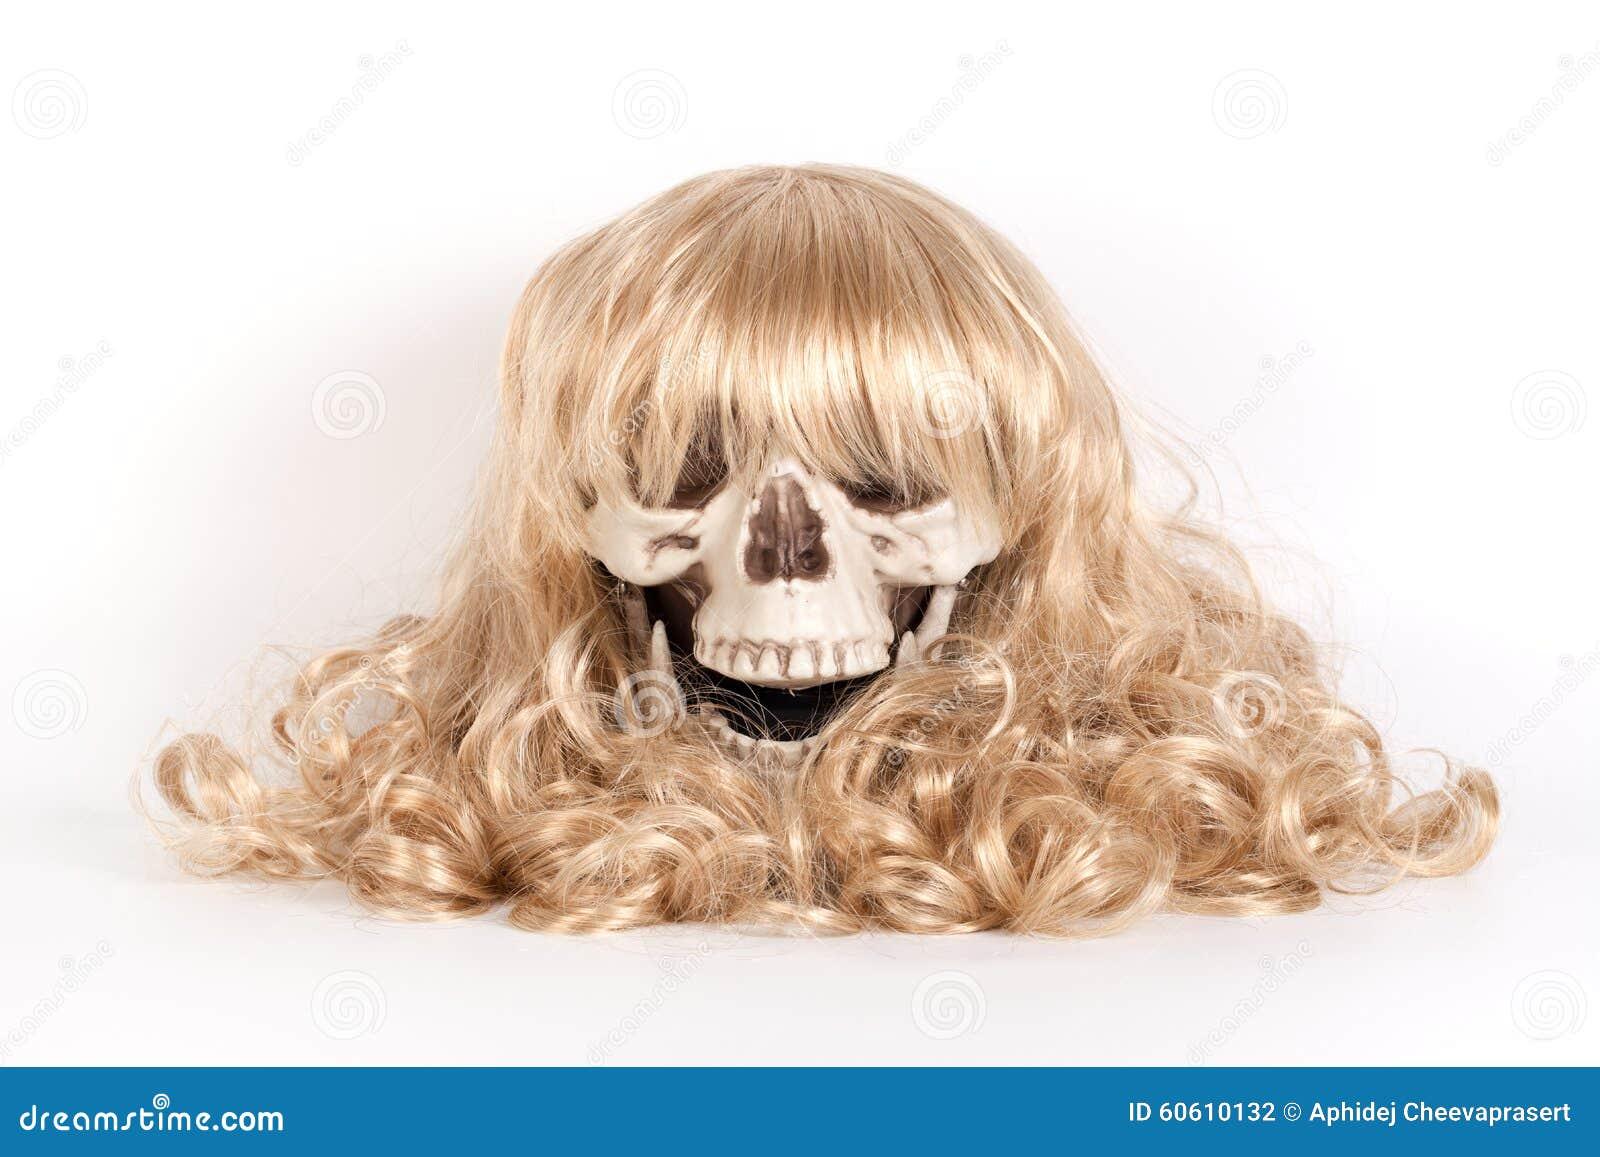 Long Human Hair Wig For Nature Woman